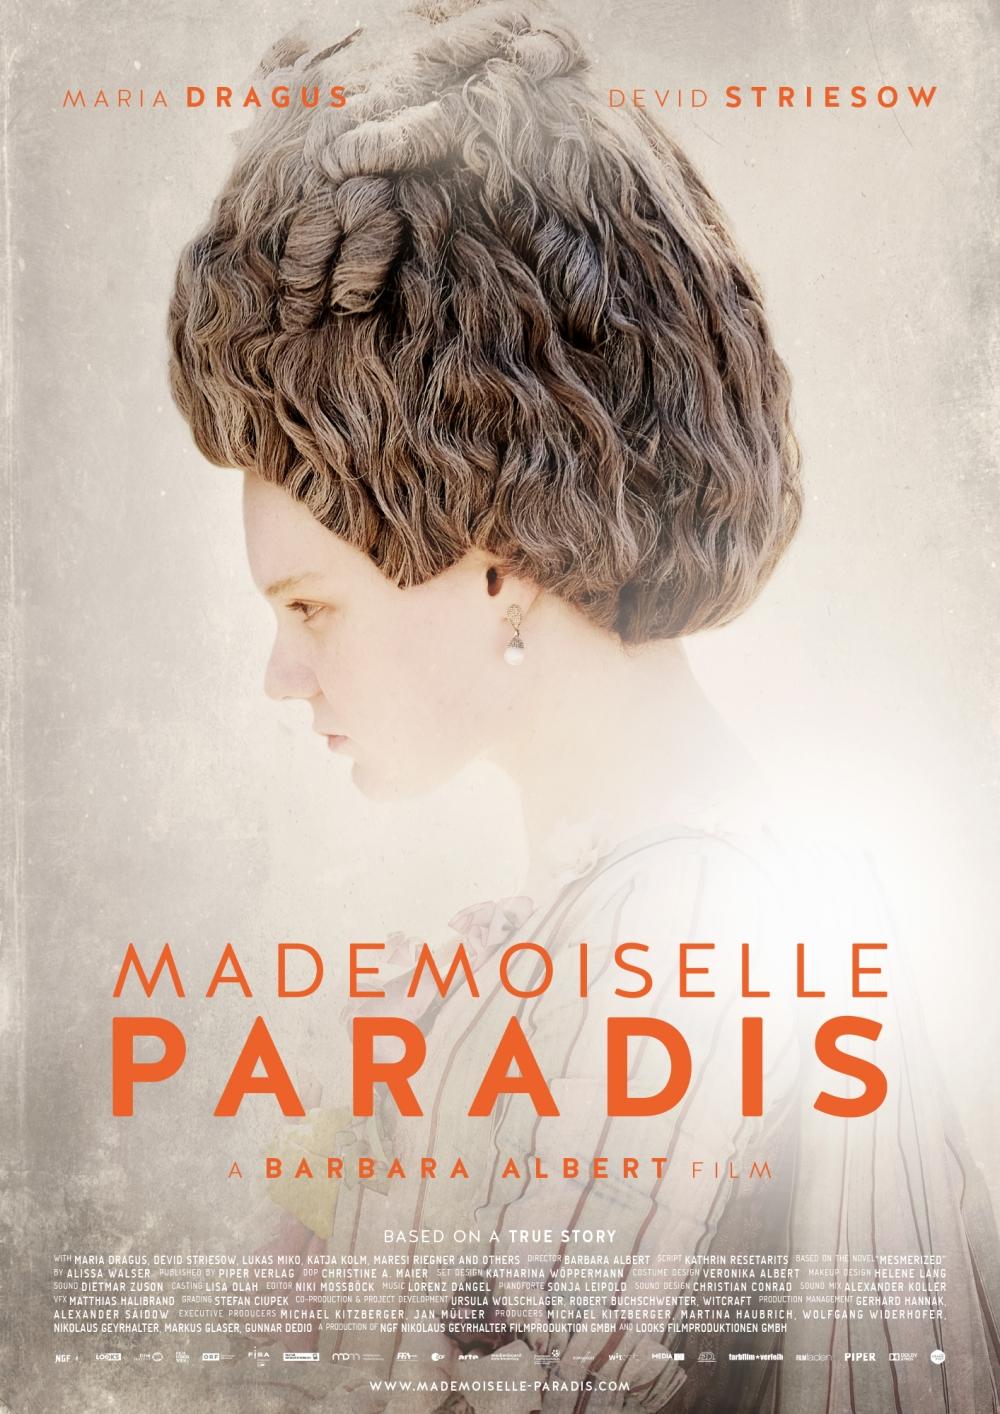 Madmuazelė Paradis (2017) / Mademoiselle Paradis